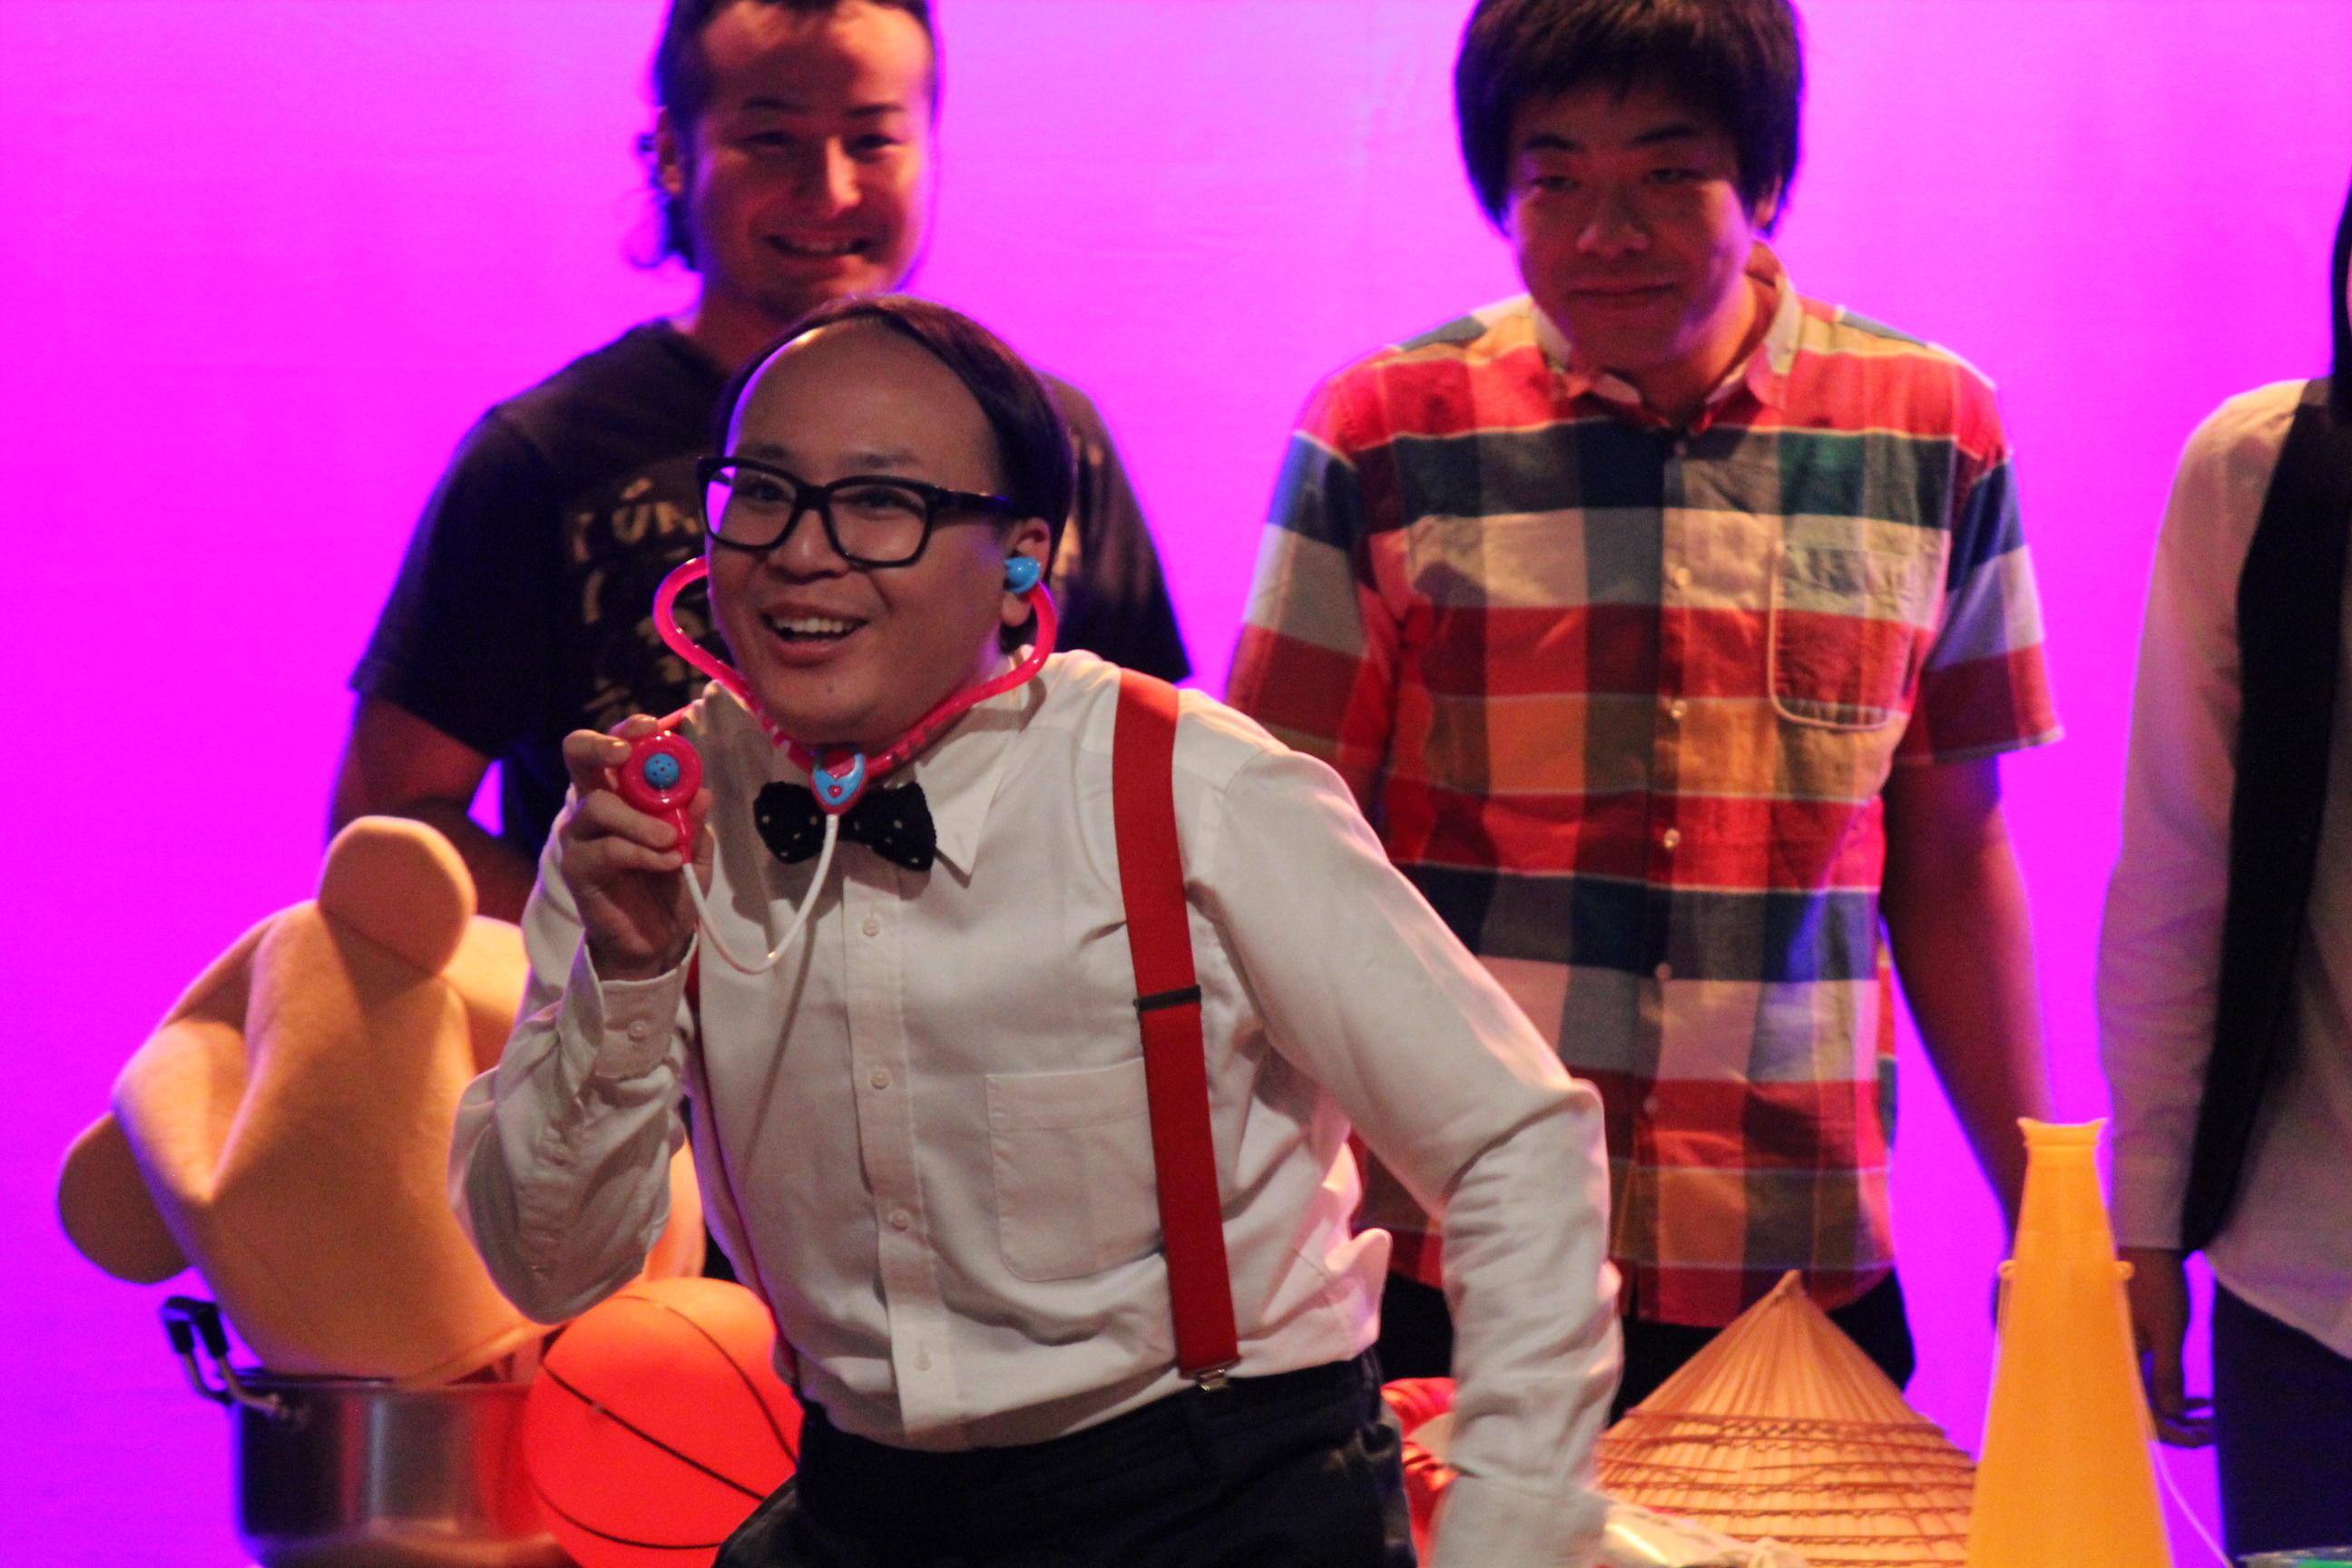 http://news.yoshimoto.co.jp/20151127175028-a1feb31d2955c3f793554d033701066700eff60a.jpg